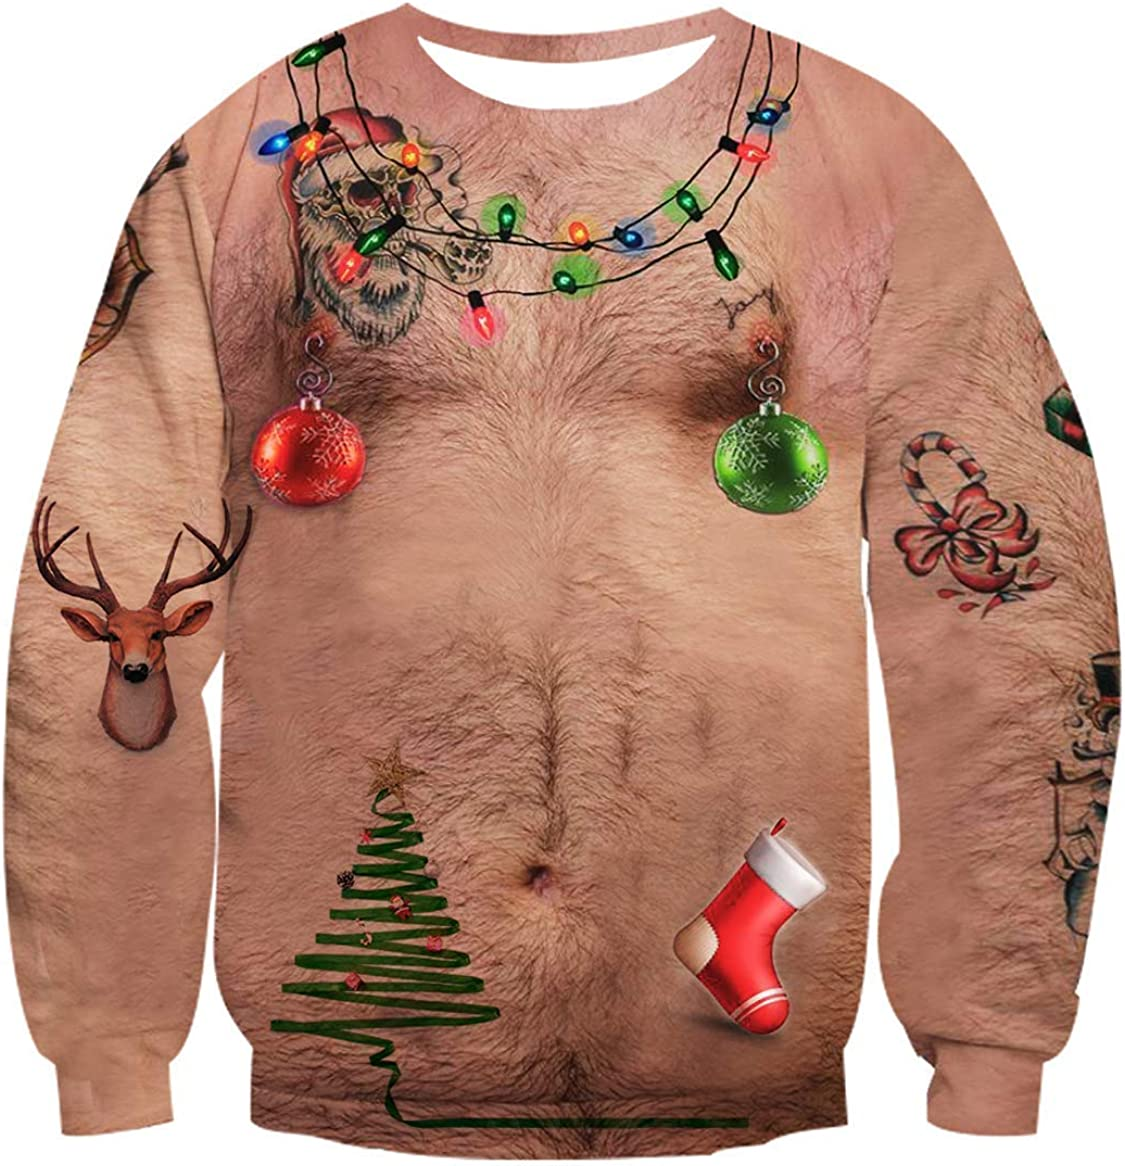 Idgreatim Unisex Bombing free shipping Ugly Christmas Crewneck Manufacturer direct delivery 3D Novelty Sweatshirt G